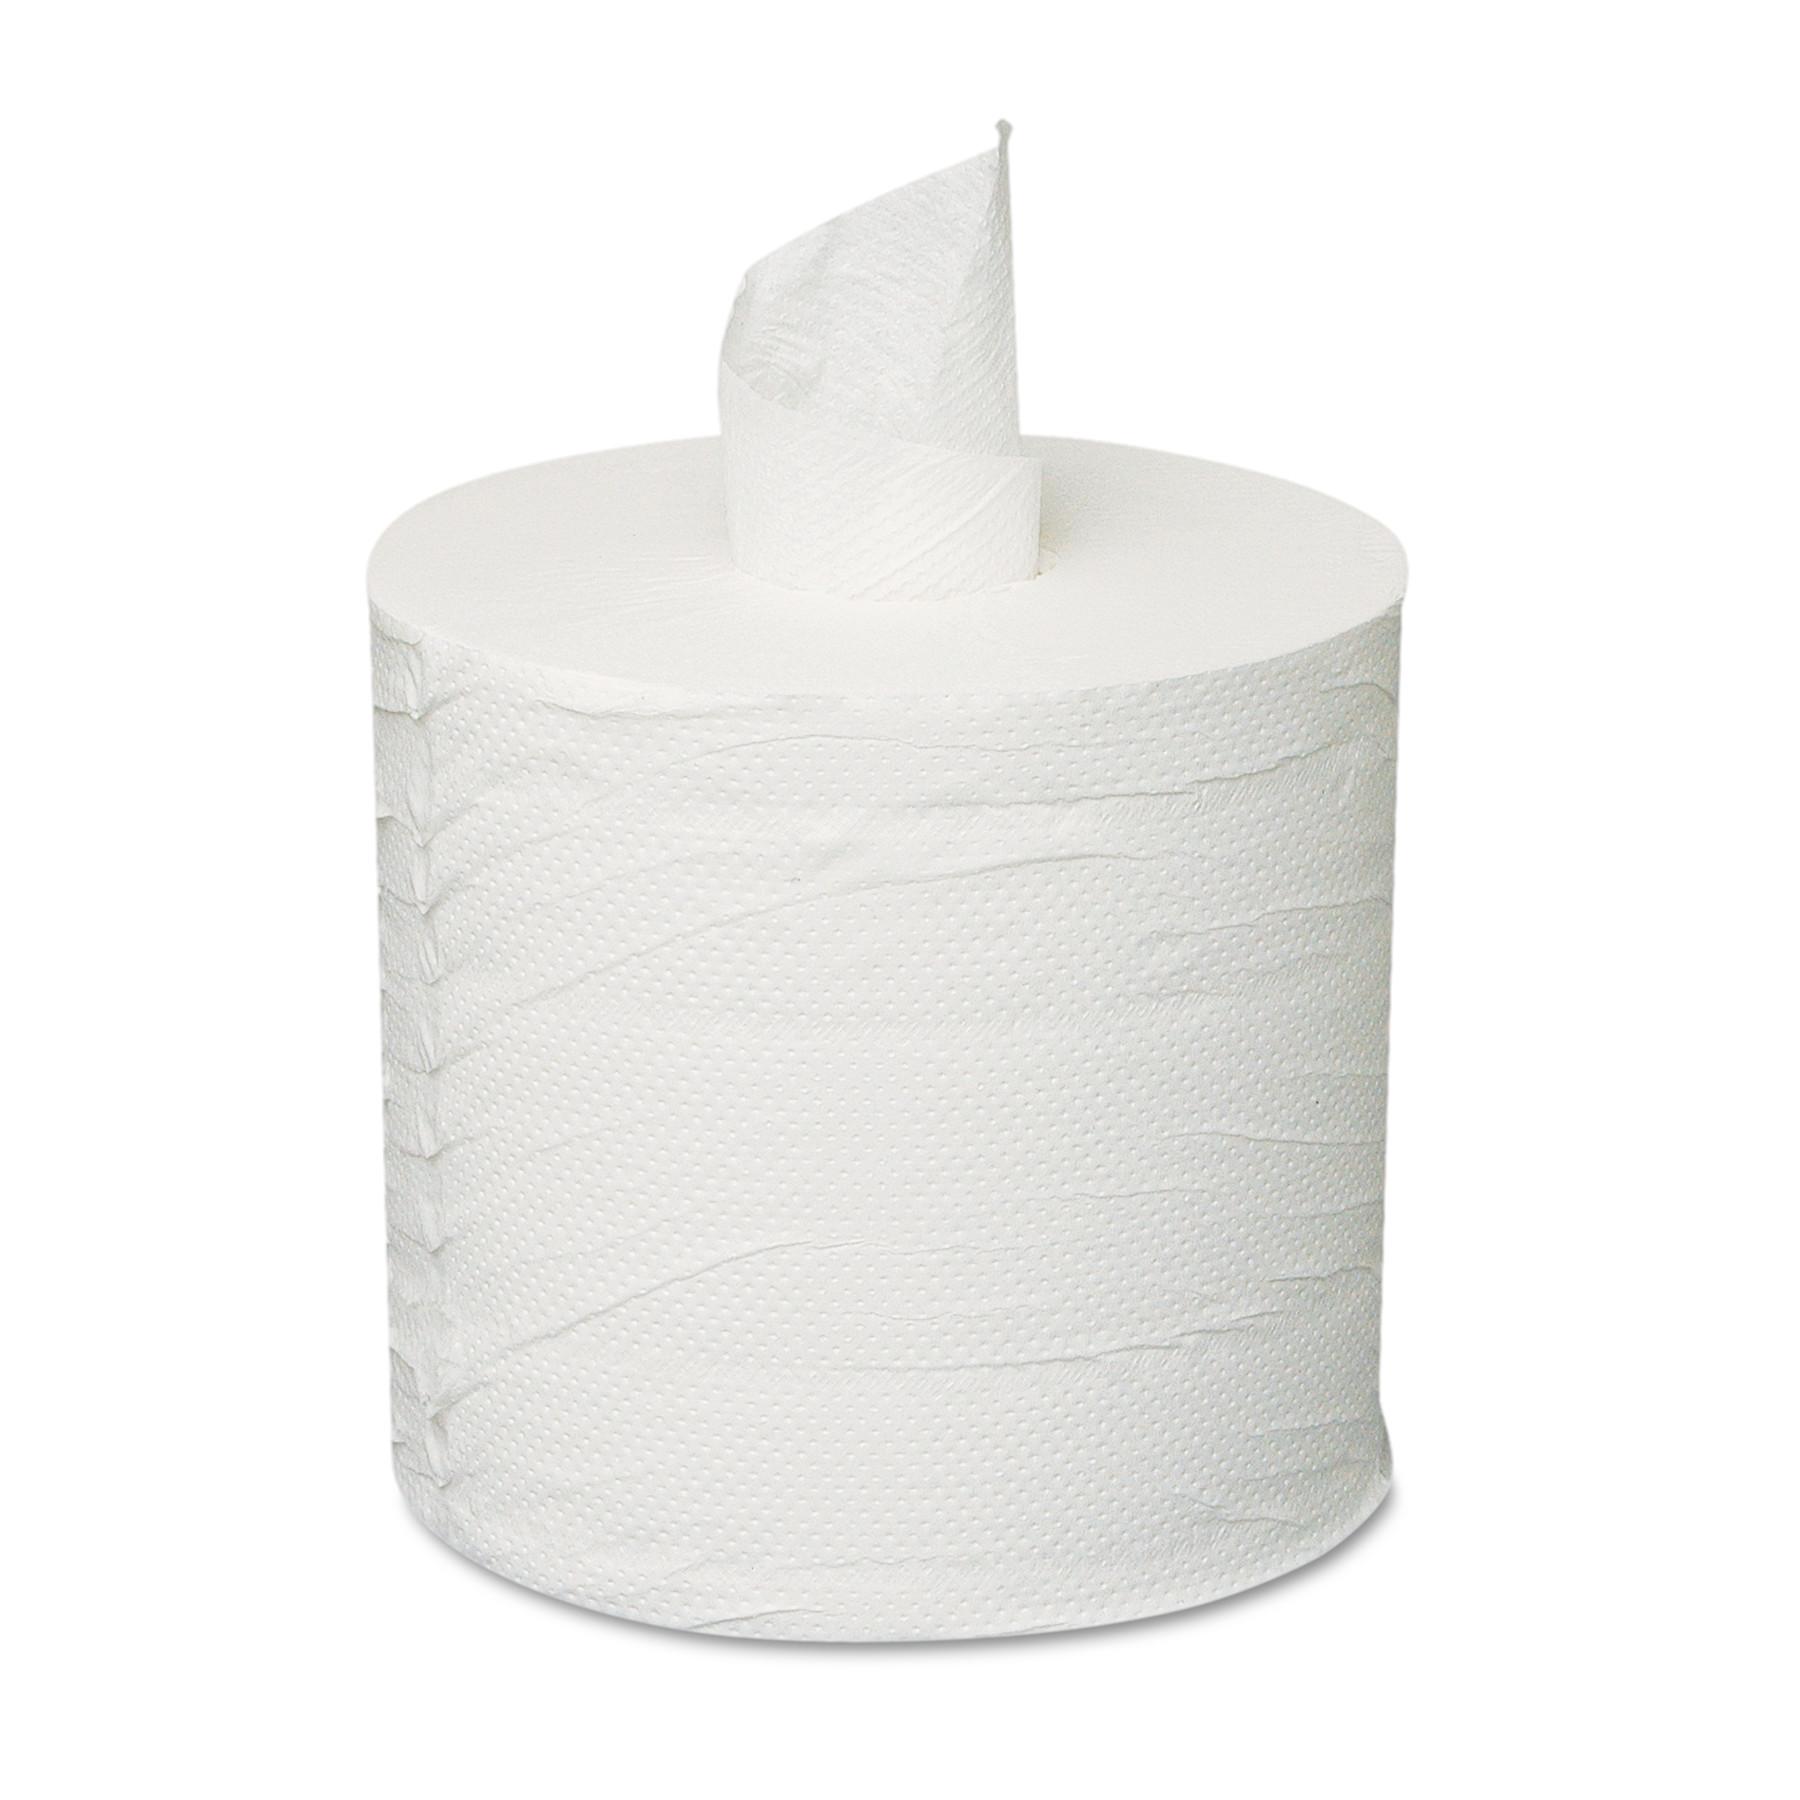 Centerpull Towels, 2-Ply, White, 6 Rolls/Carton